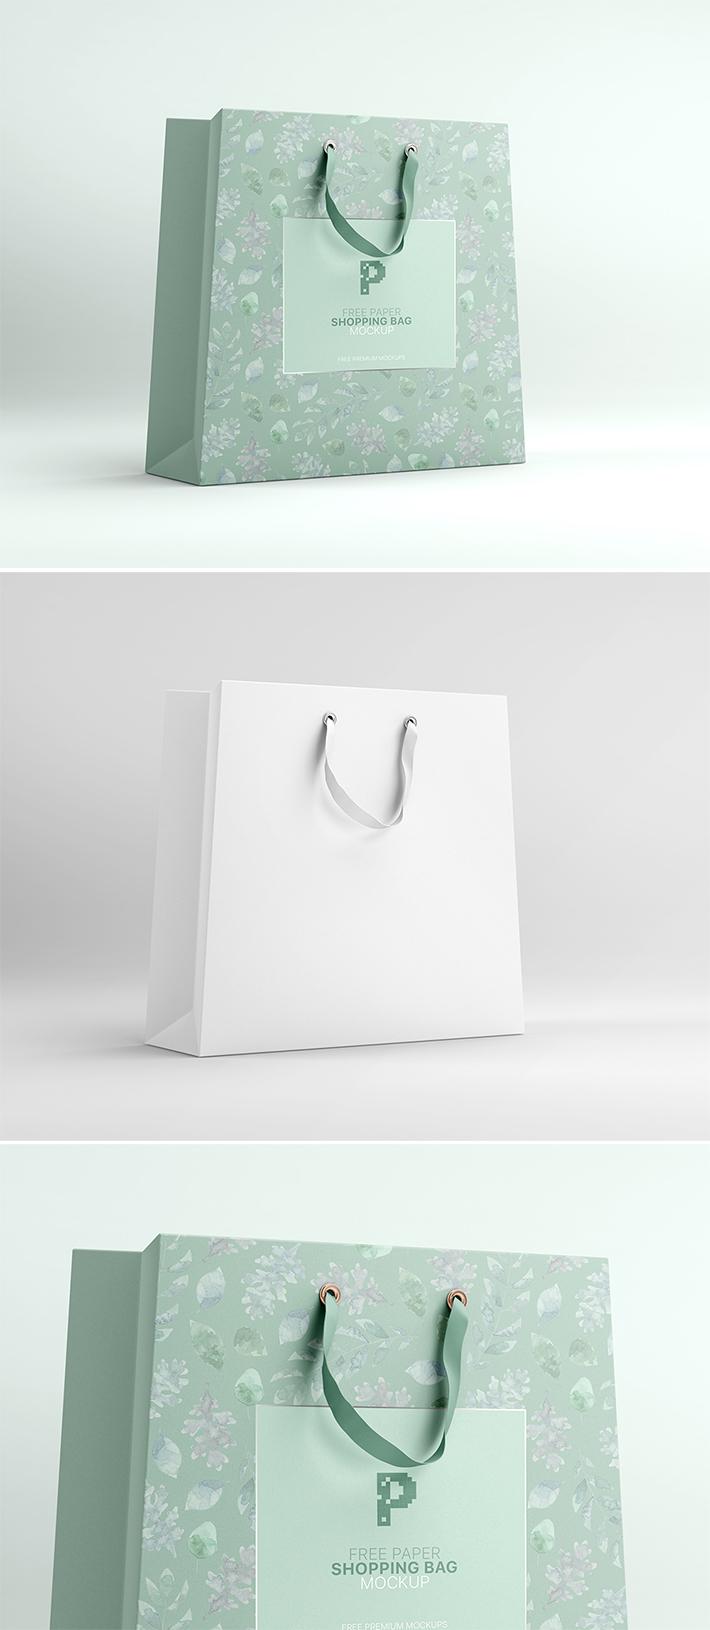 Download Elegant Simple Shopping Bag Mockup Free Freebies Bag Mockup Free Mockup Wedding Photography Business Card